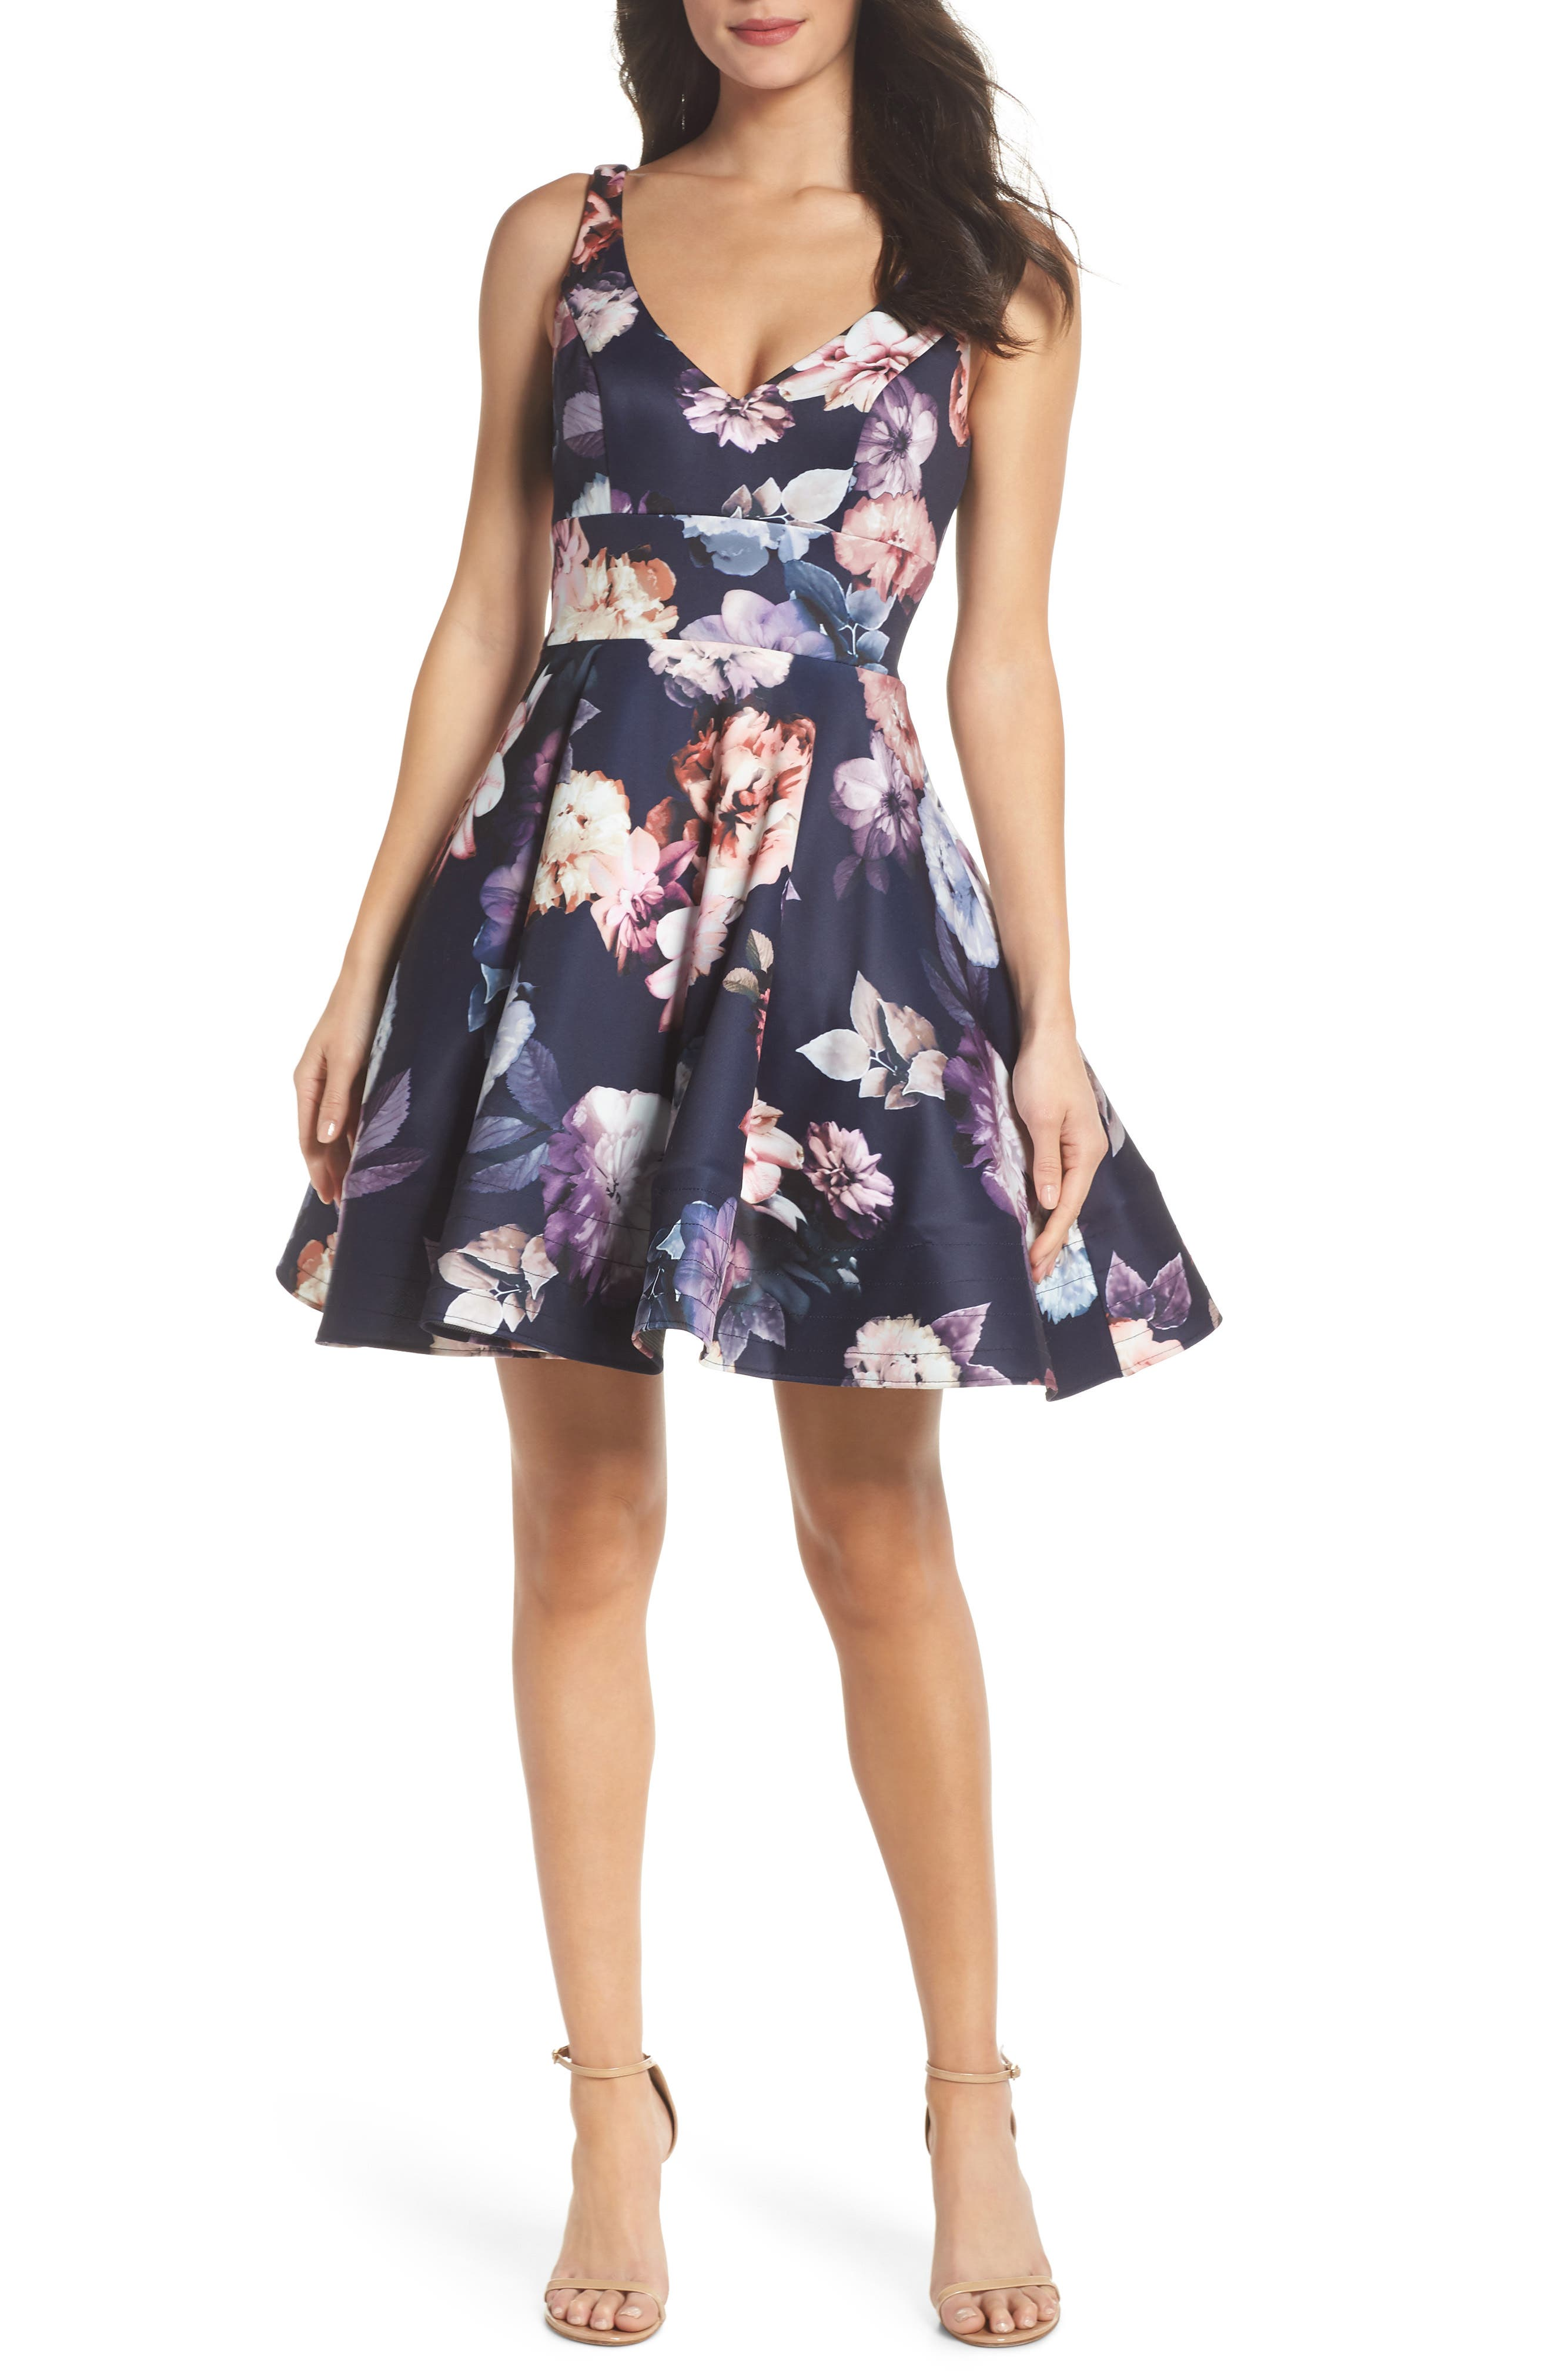 Floral Print Fit & Flare Dress,                             Main thumbnail 1, color,                             NAVY/ PURPLE